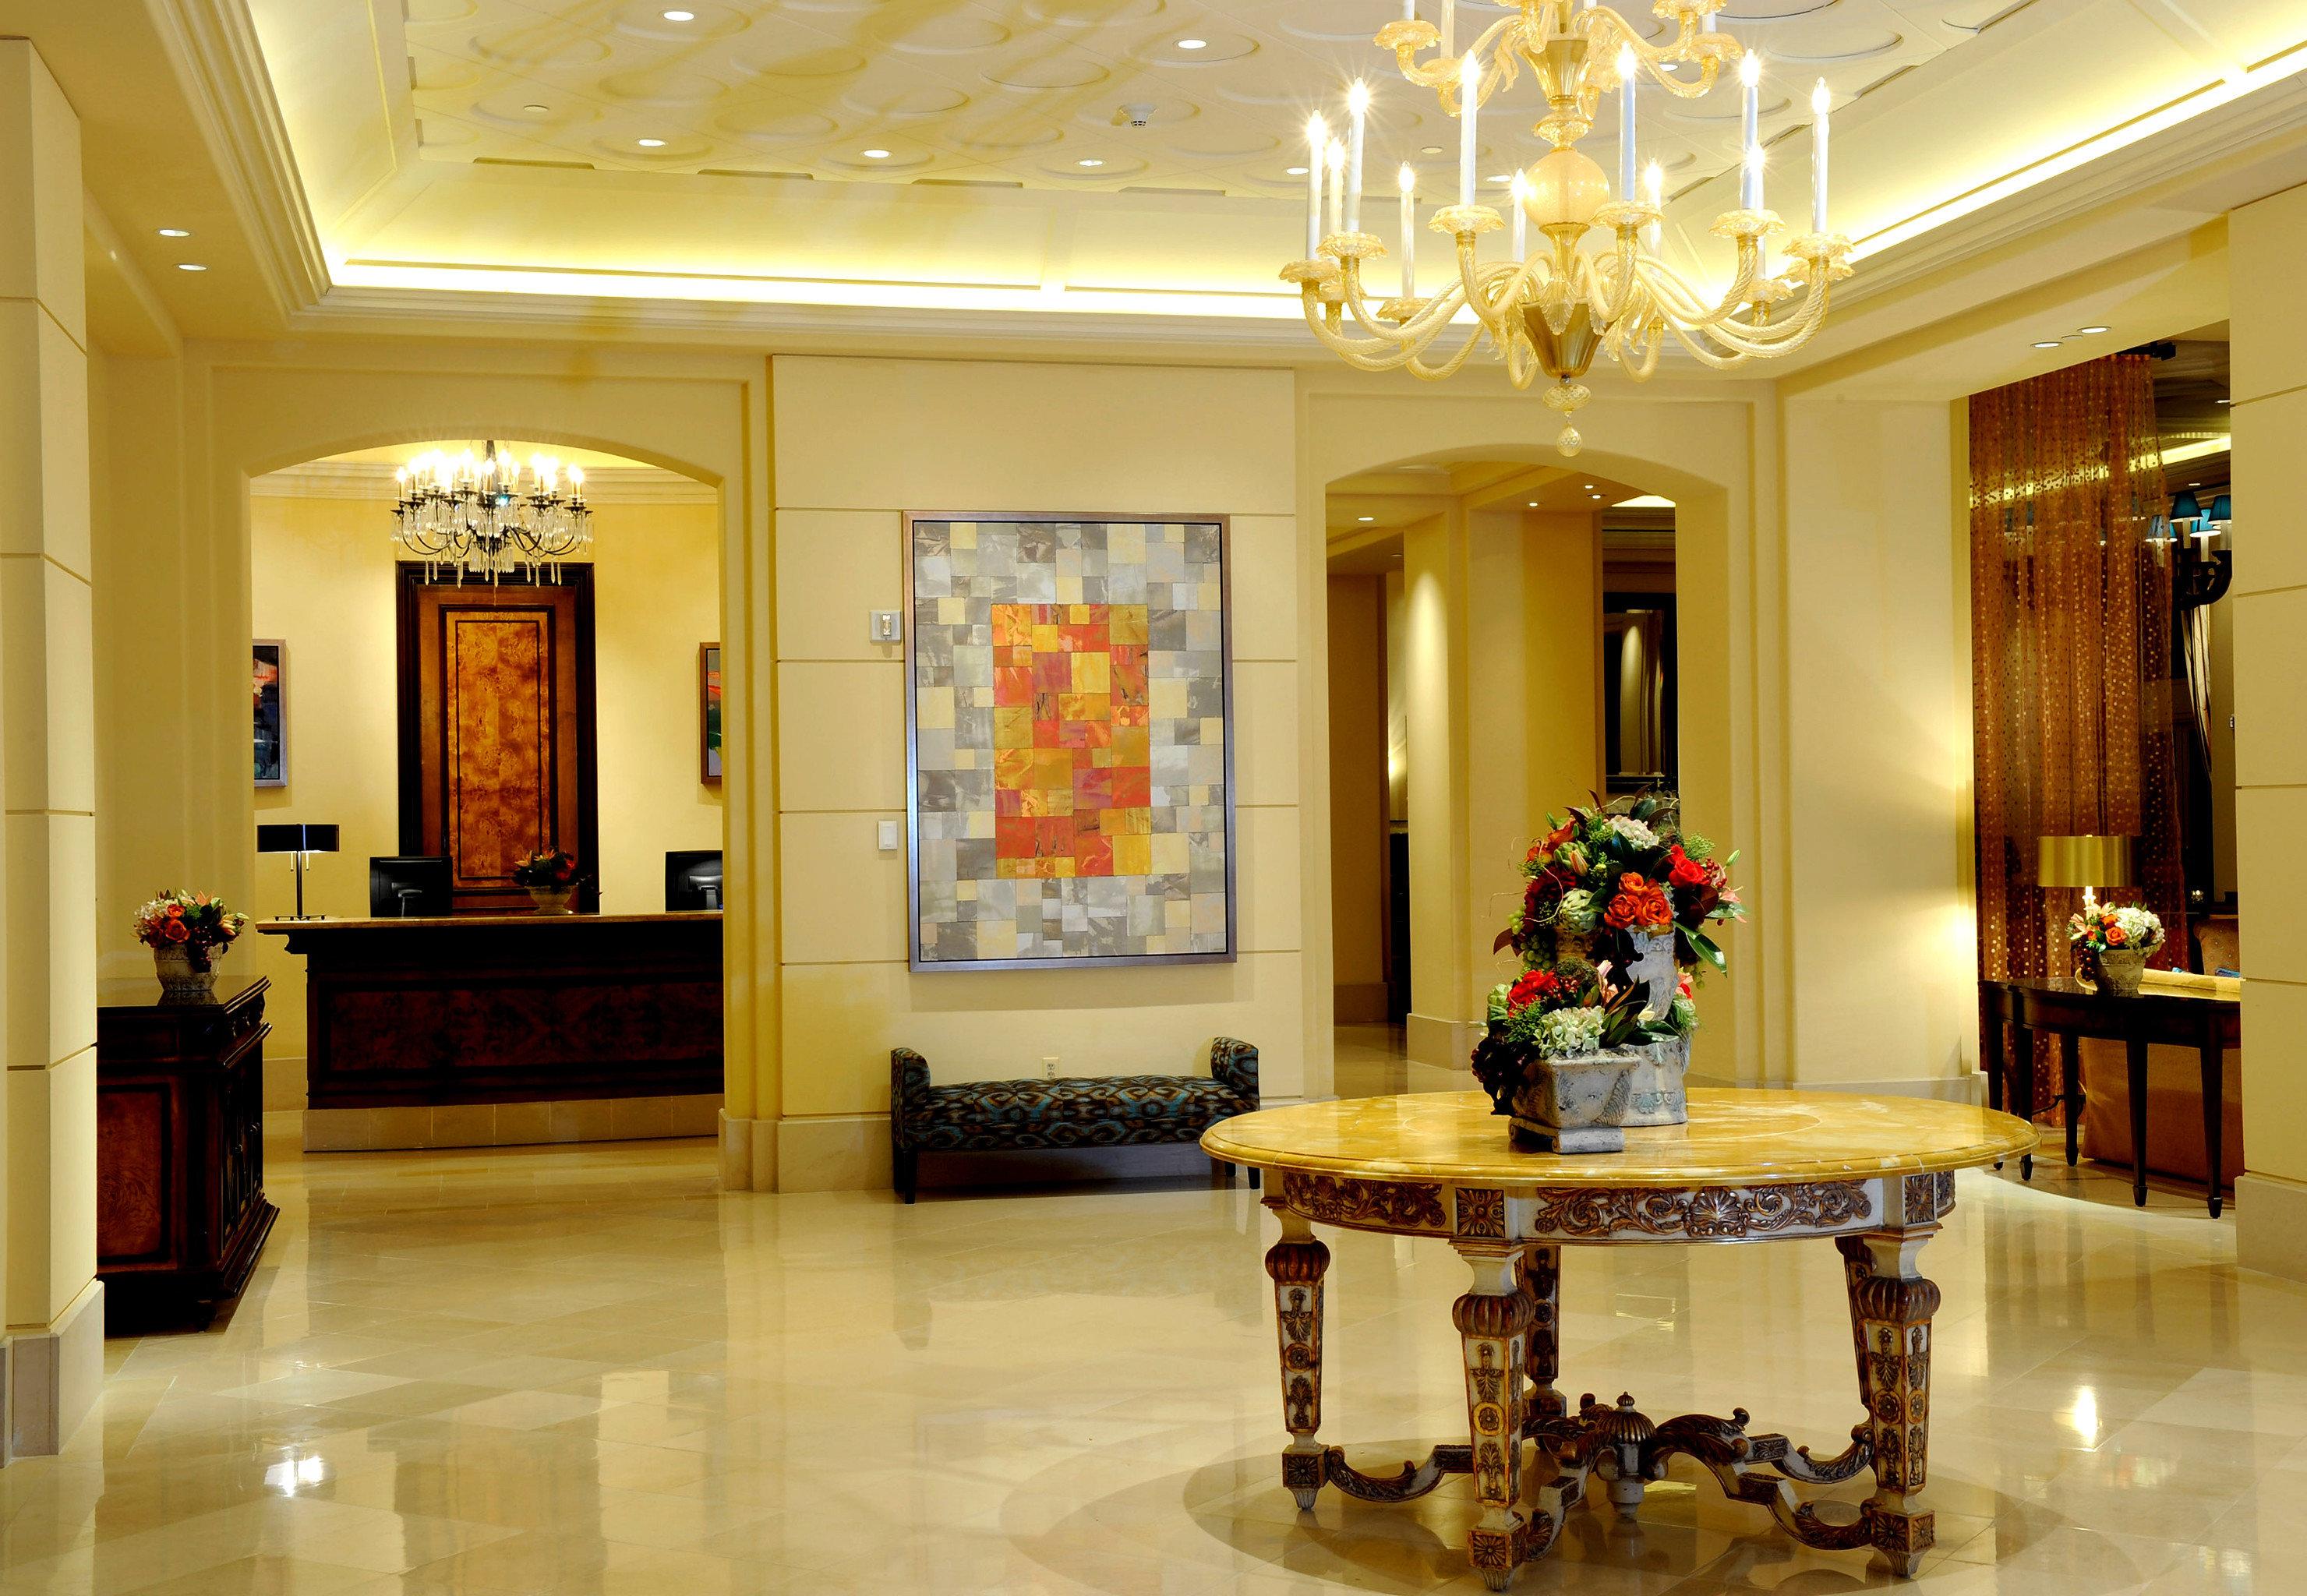 Lobby Modern Resort property home living room mansion palace flooring hall tourist attraction ballroom